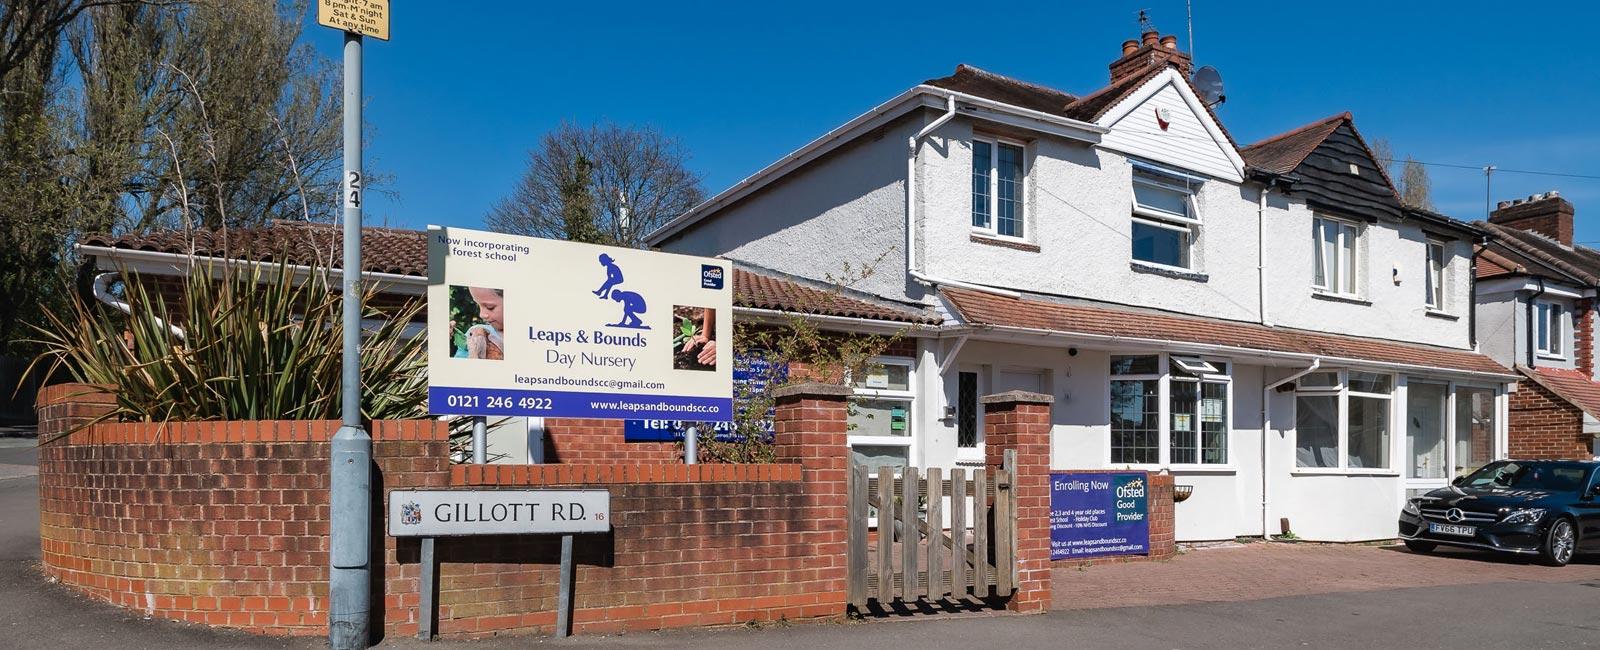 Leaps & Bounds Day Nursery is at 161 Gillott Road, Edgbaston, Birmingham B16 0ET, near Harborne, Ladywood, Bearwood and Smethwick.